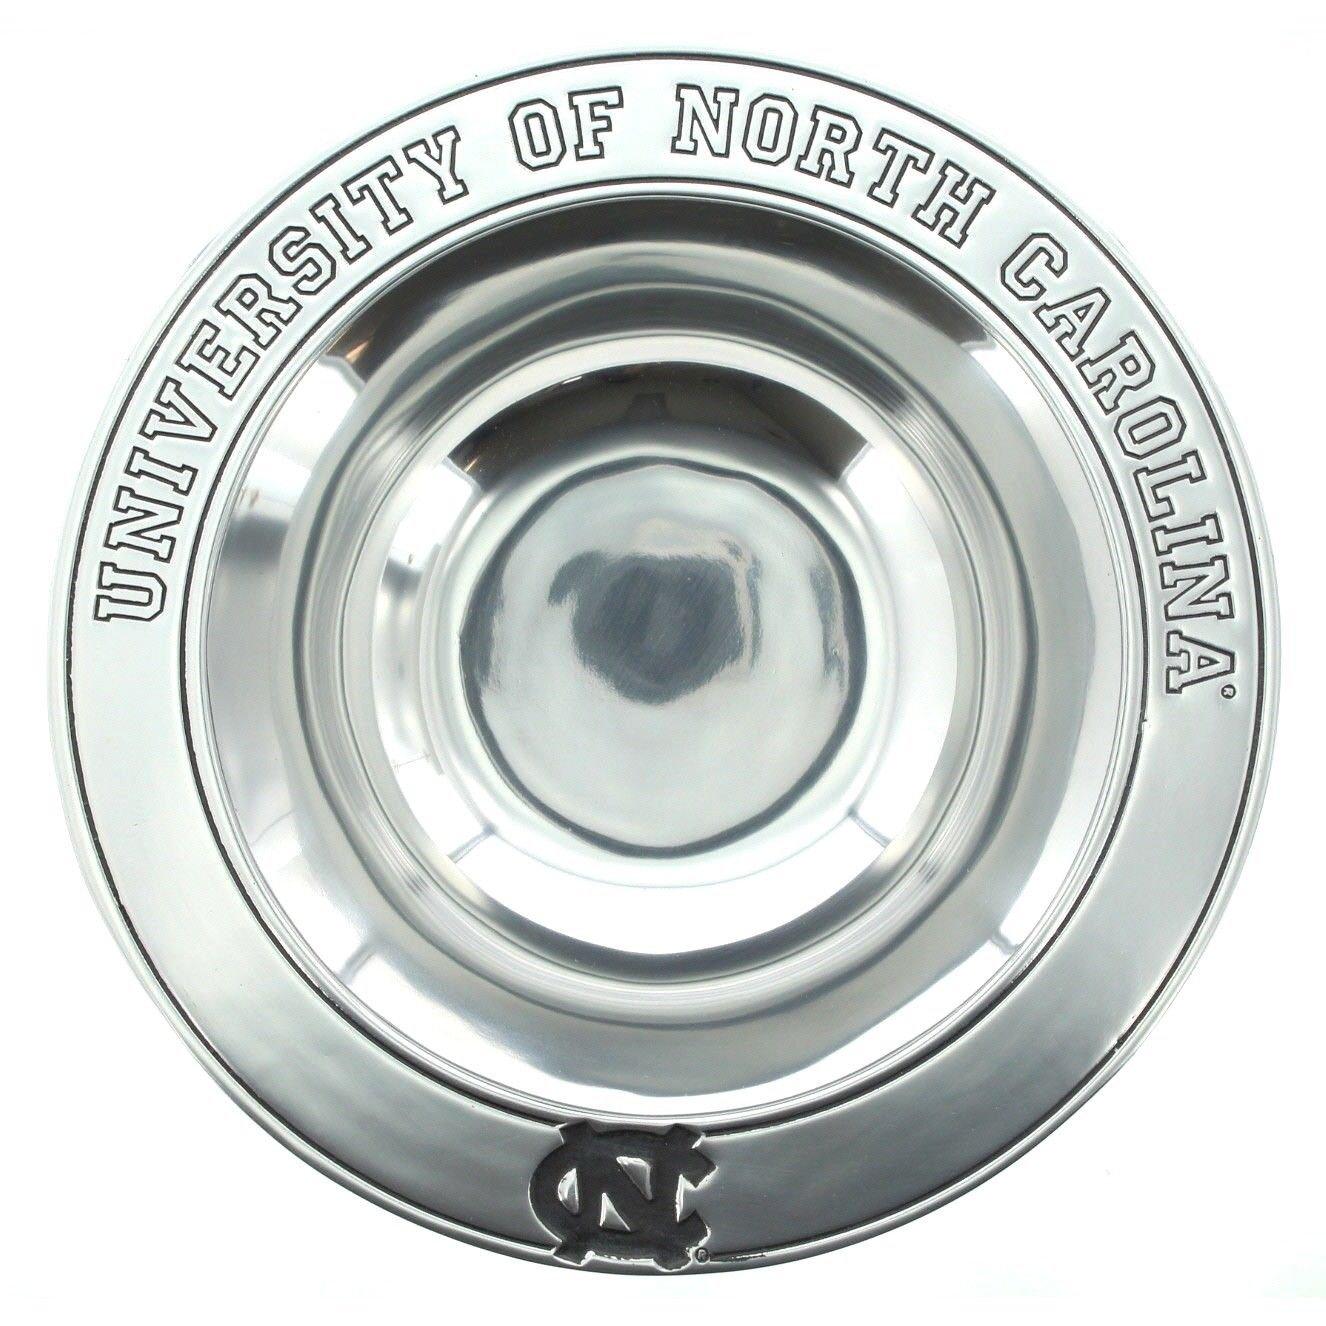 Wilton Armetale University College Medium Round Silver Serving Bowl, 12.5 Inch